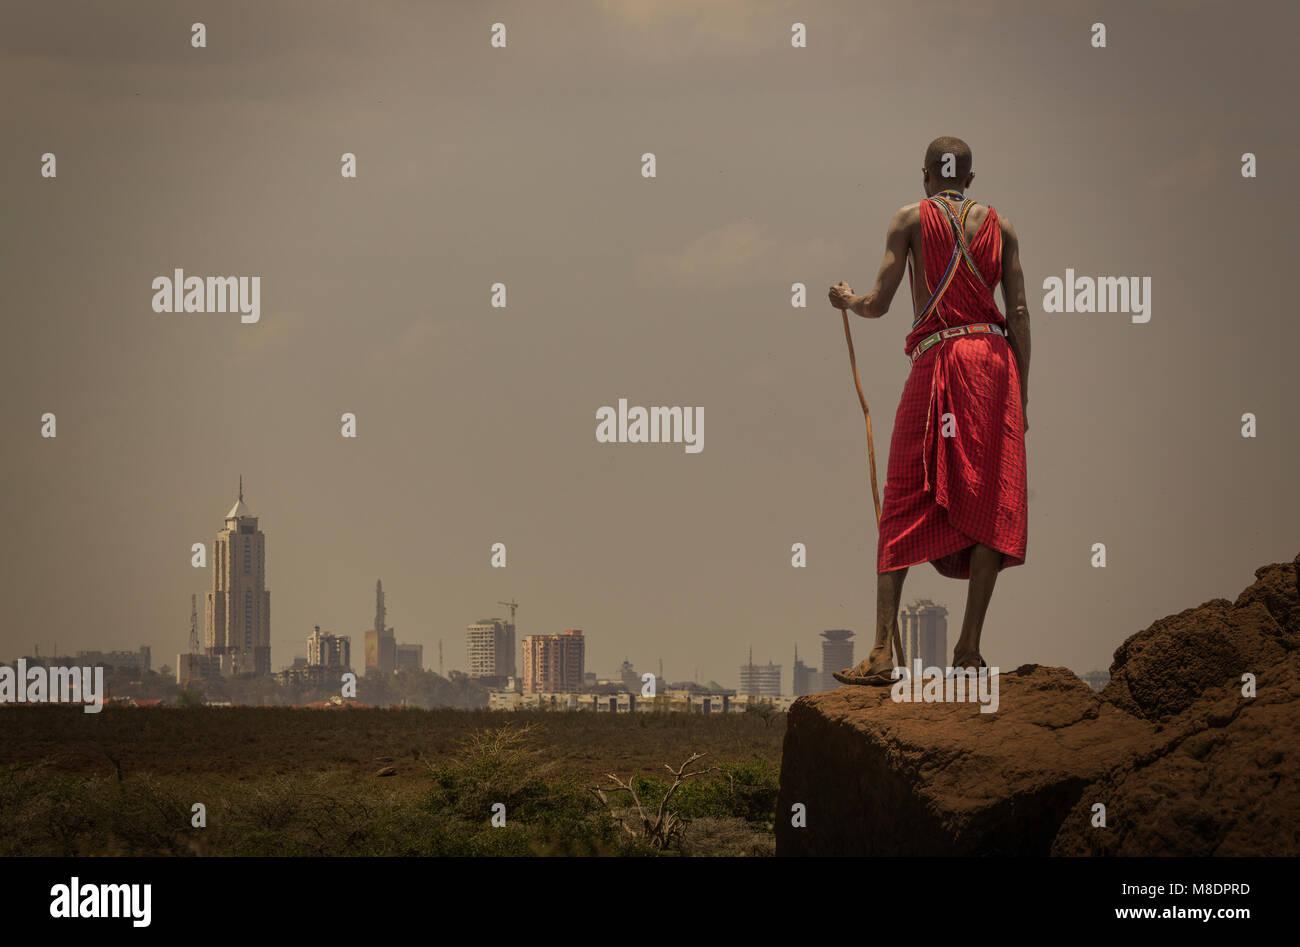 Masai hombre con traje tradicional del horizonte viendo Nairobi, Nairobi, Nairobi, Kenia Foto de stock